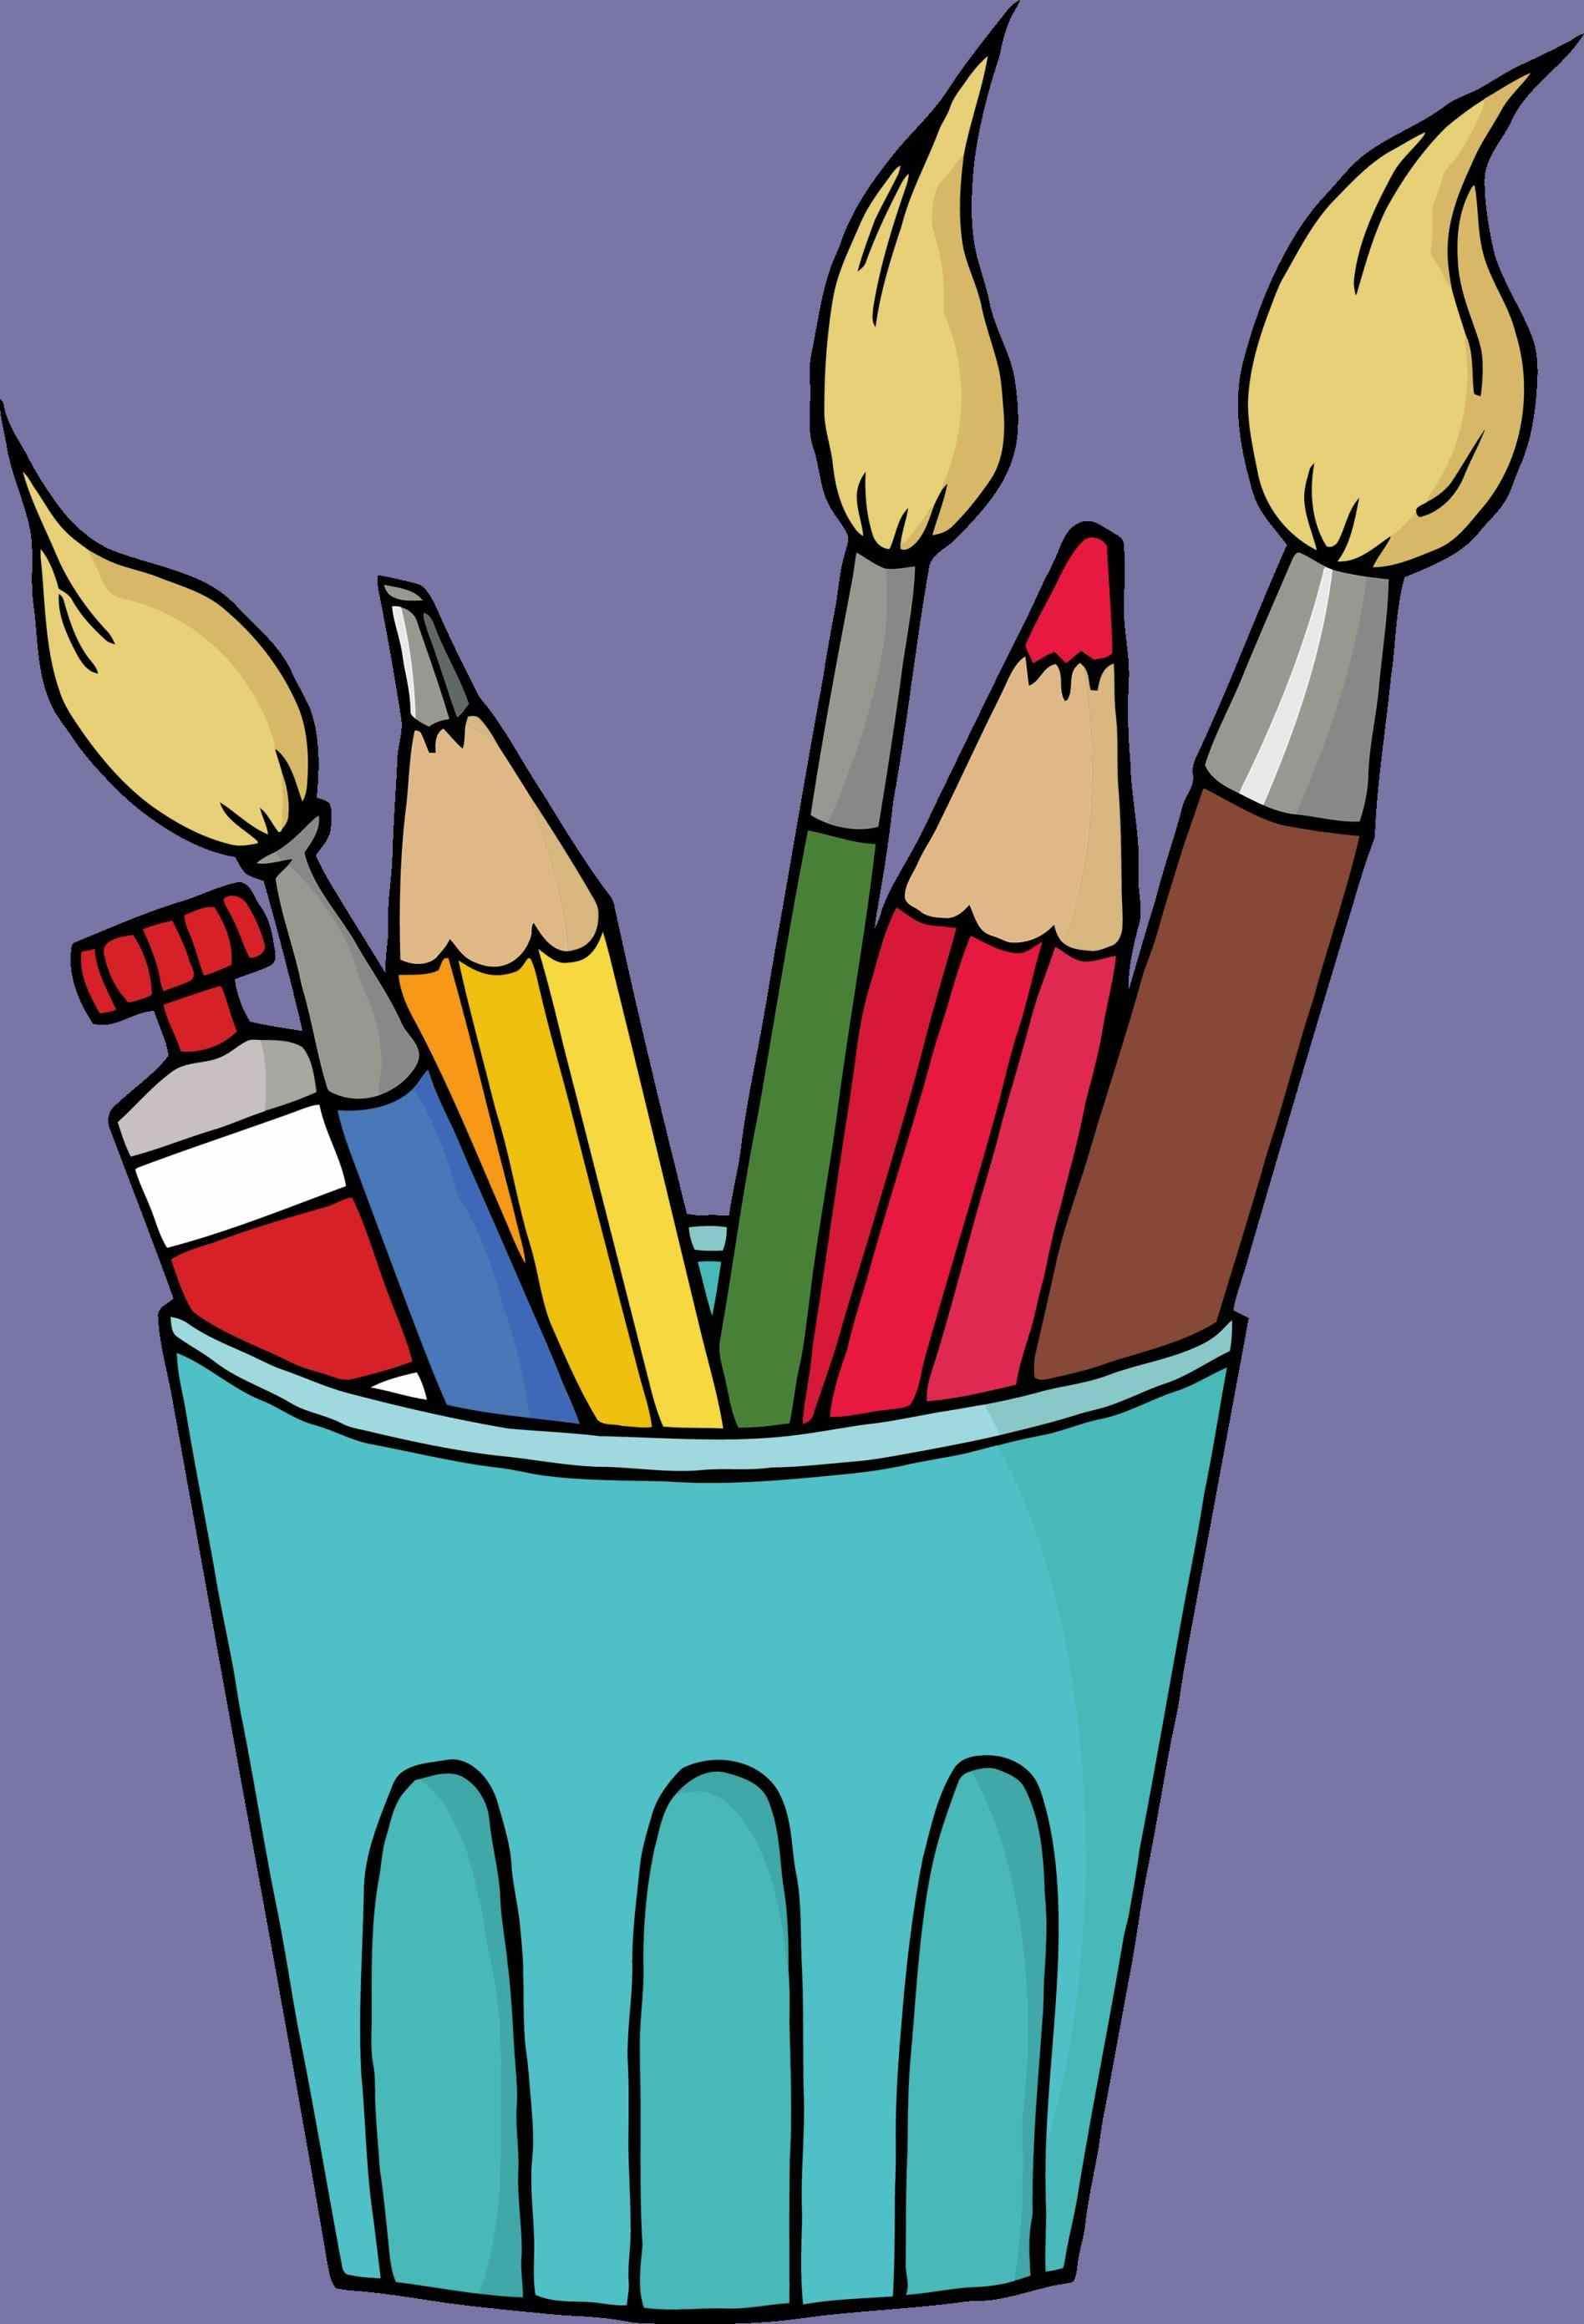 1896x2782 Kids Craft Supplies Clipart Arts S Clip Art Cbyg Wiki School